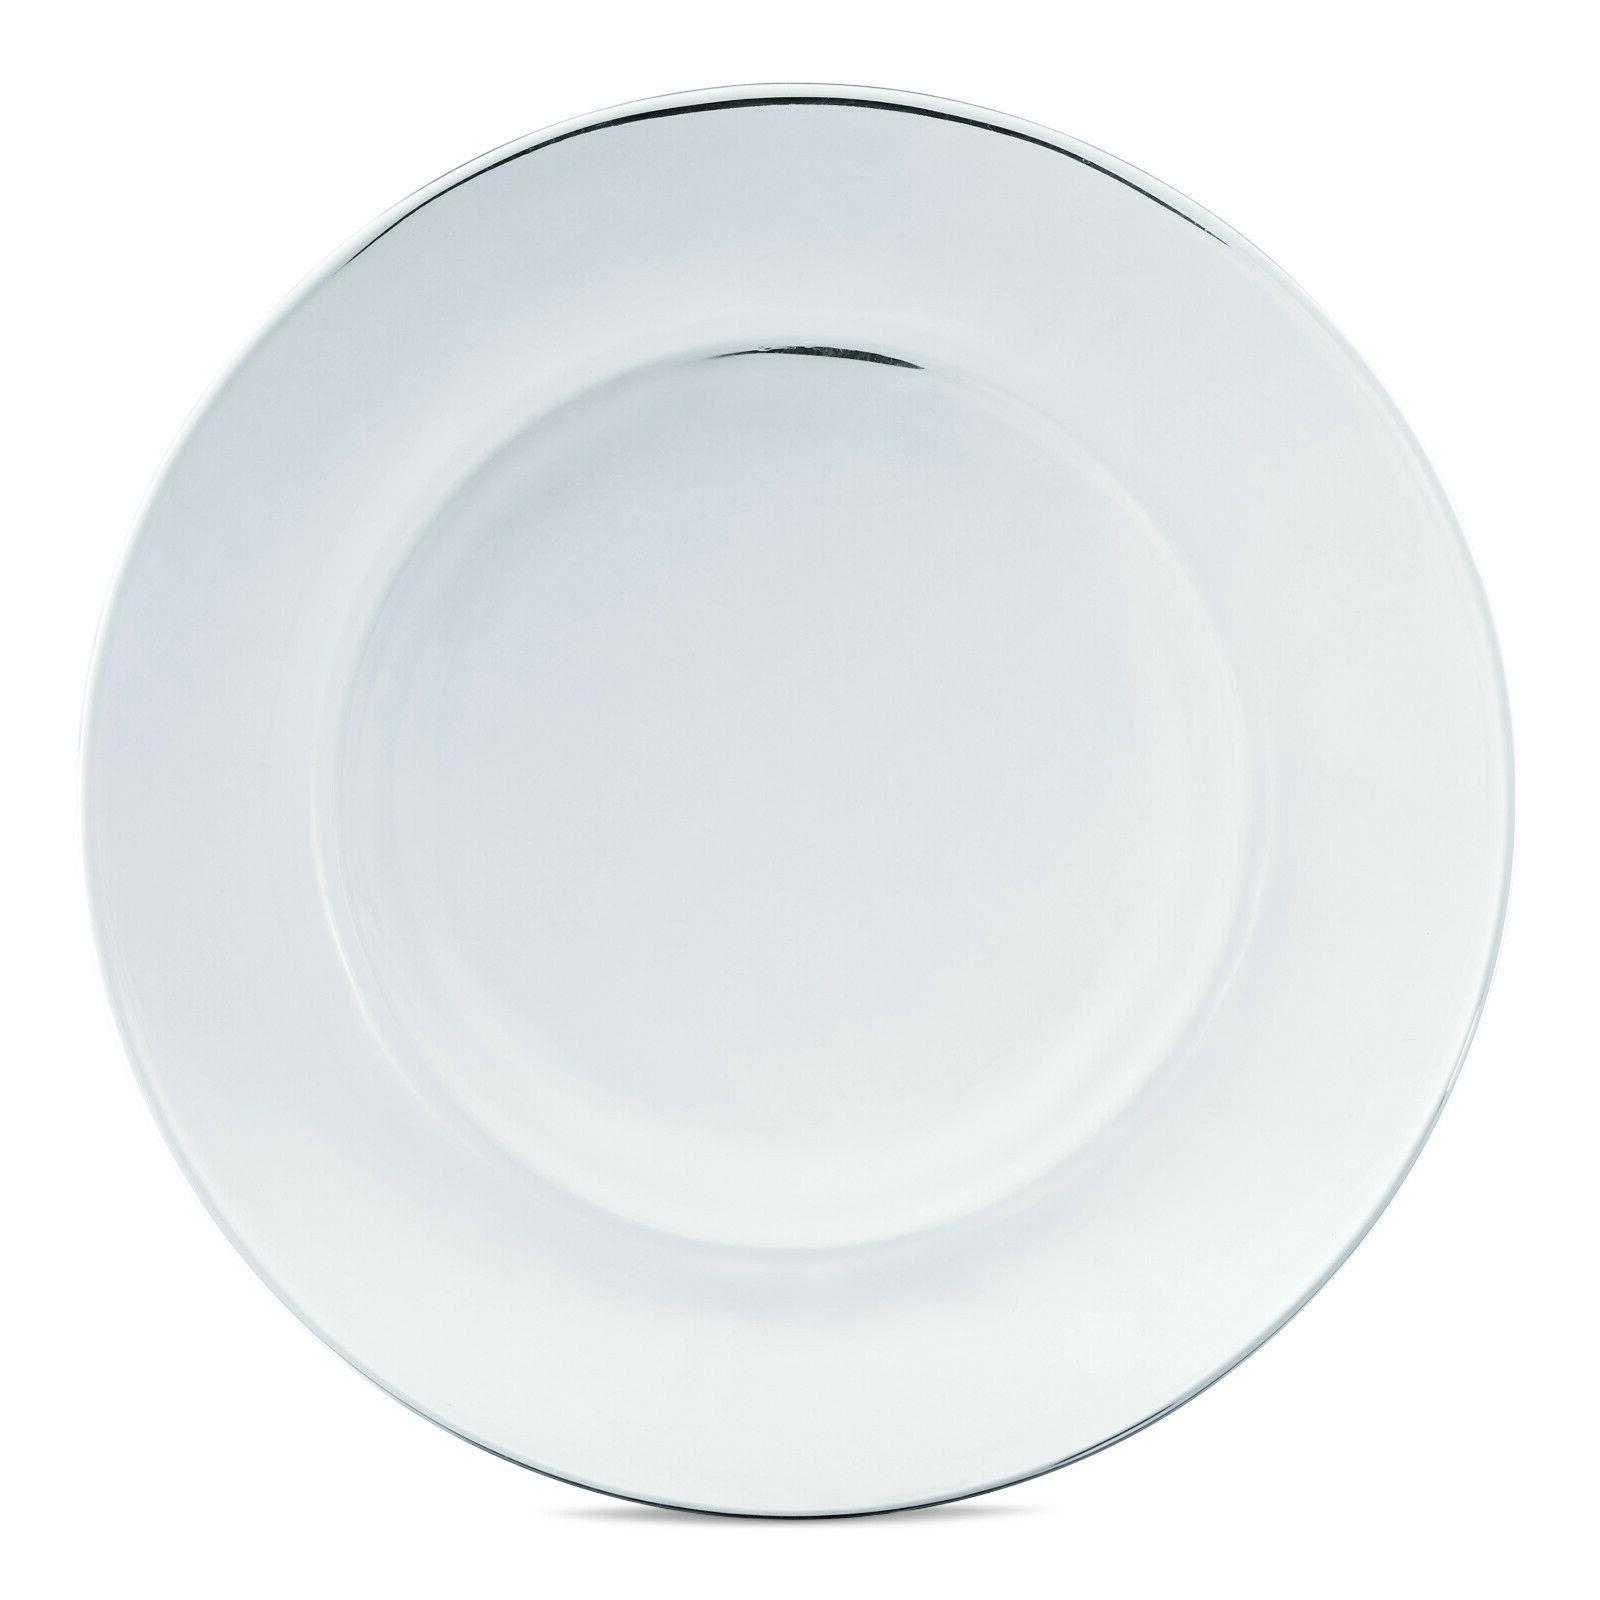 Dinnerware 12 Modern Glass Plates Bowls Dishes